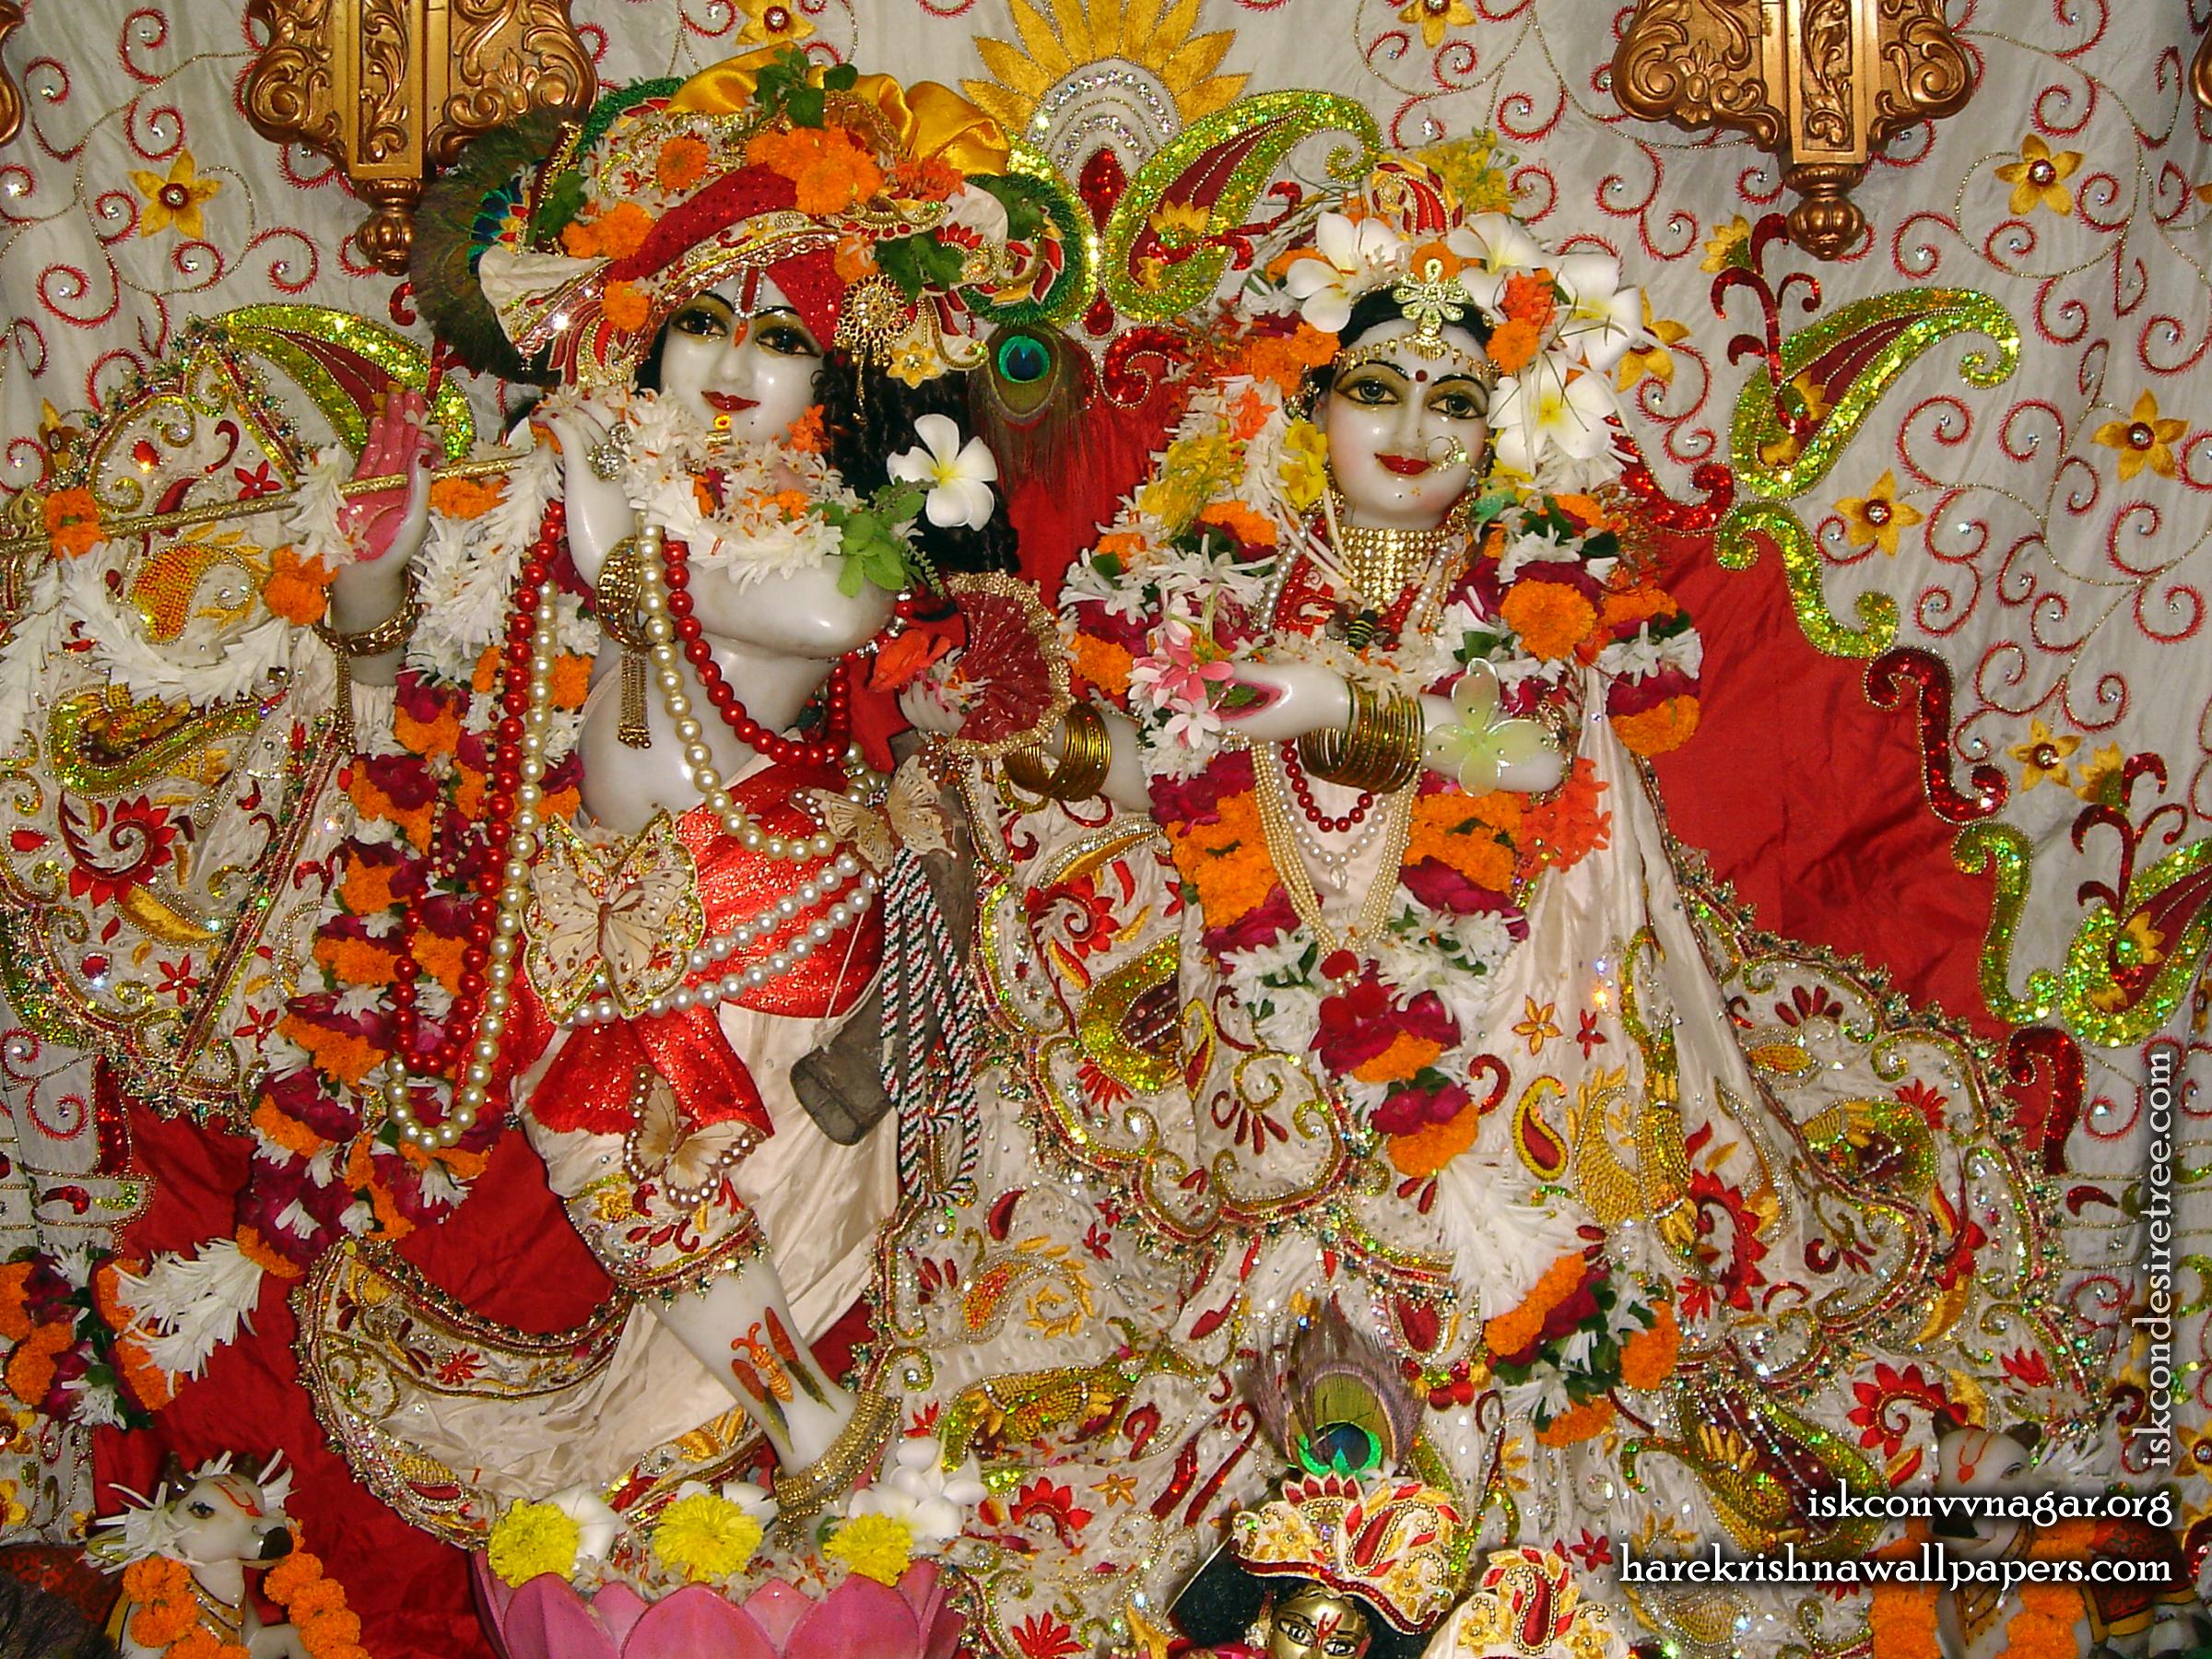 Sri Sri Radha Giridhari Wallpaper (025) Size 2400x1800 Download